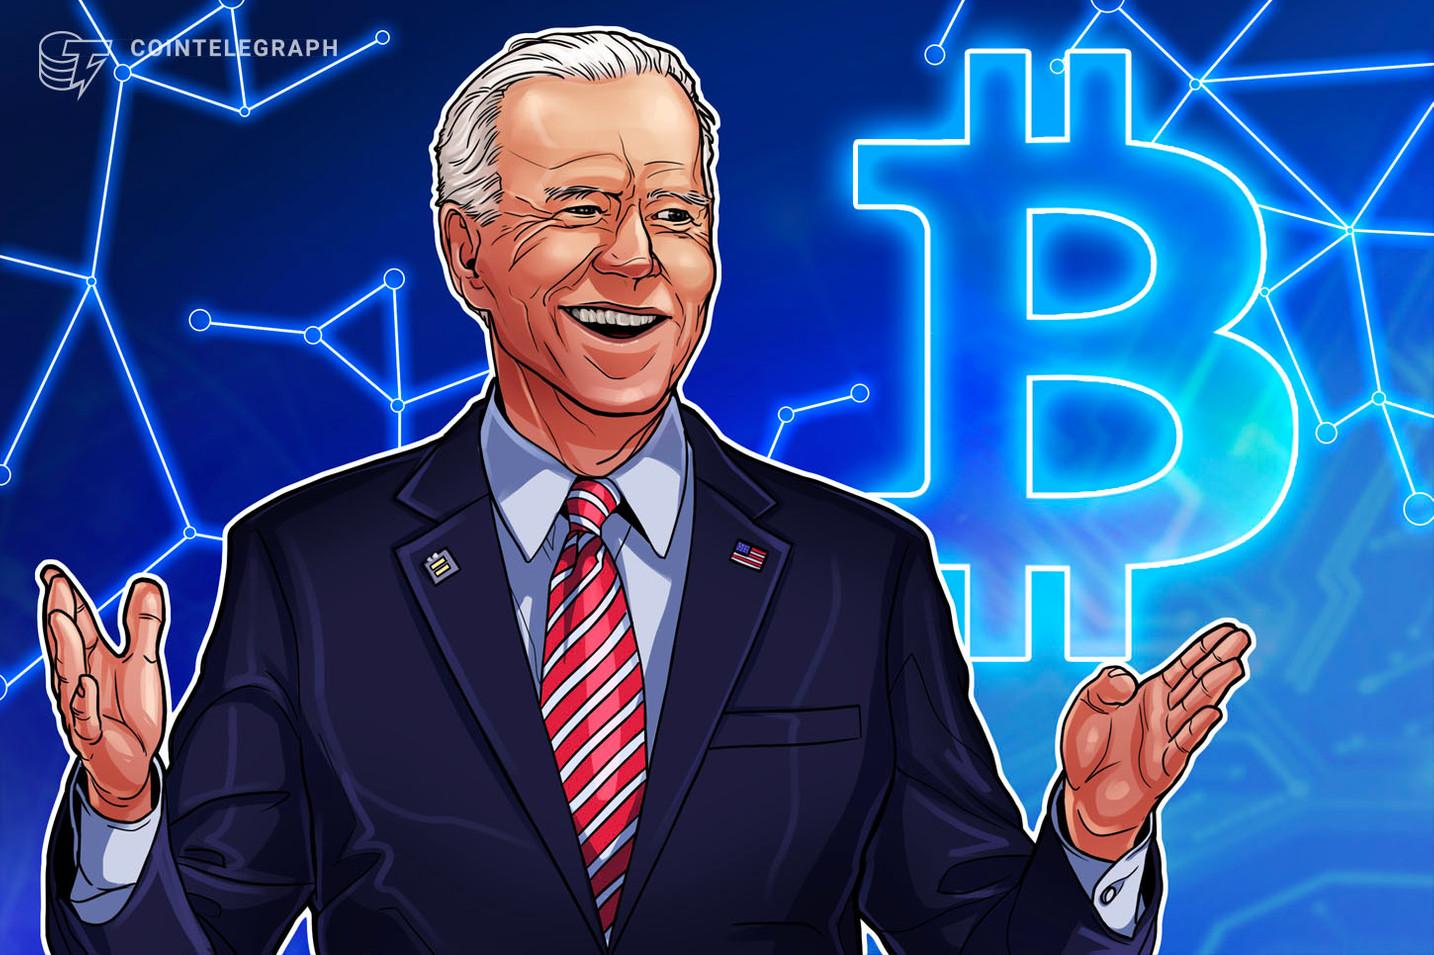 Biden should integrate Bitcoin into US financial system, says Niall Ferguson